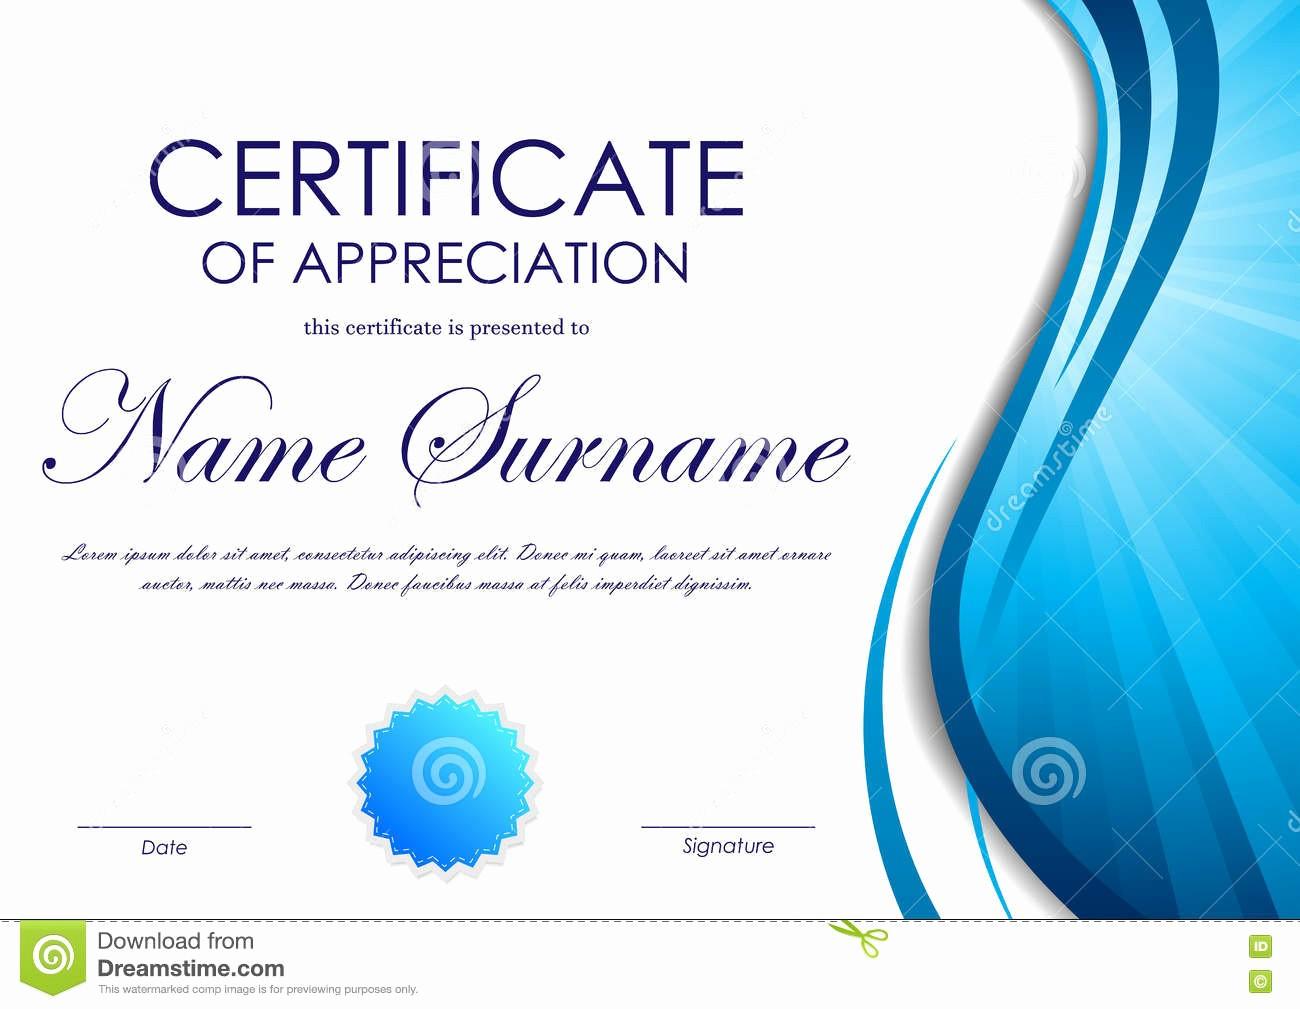 Certificate Background Design Free Download New Certificate Appreciation Template Stock Vector